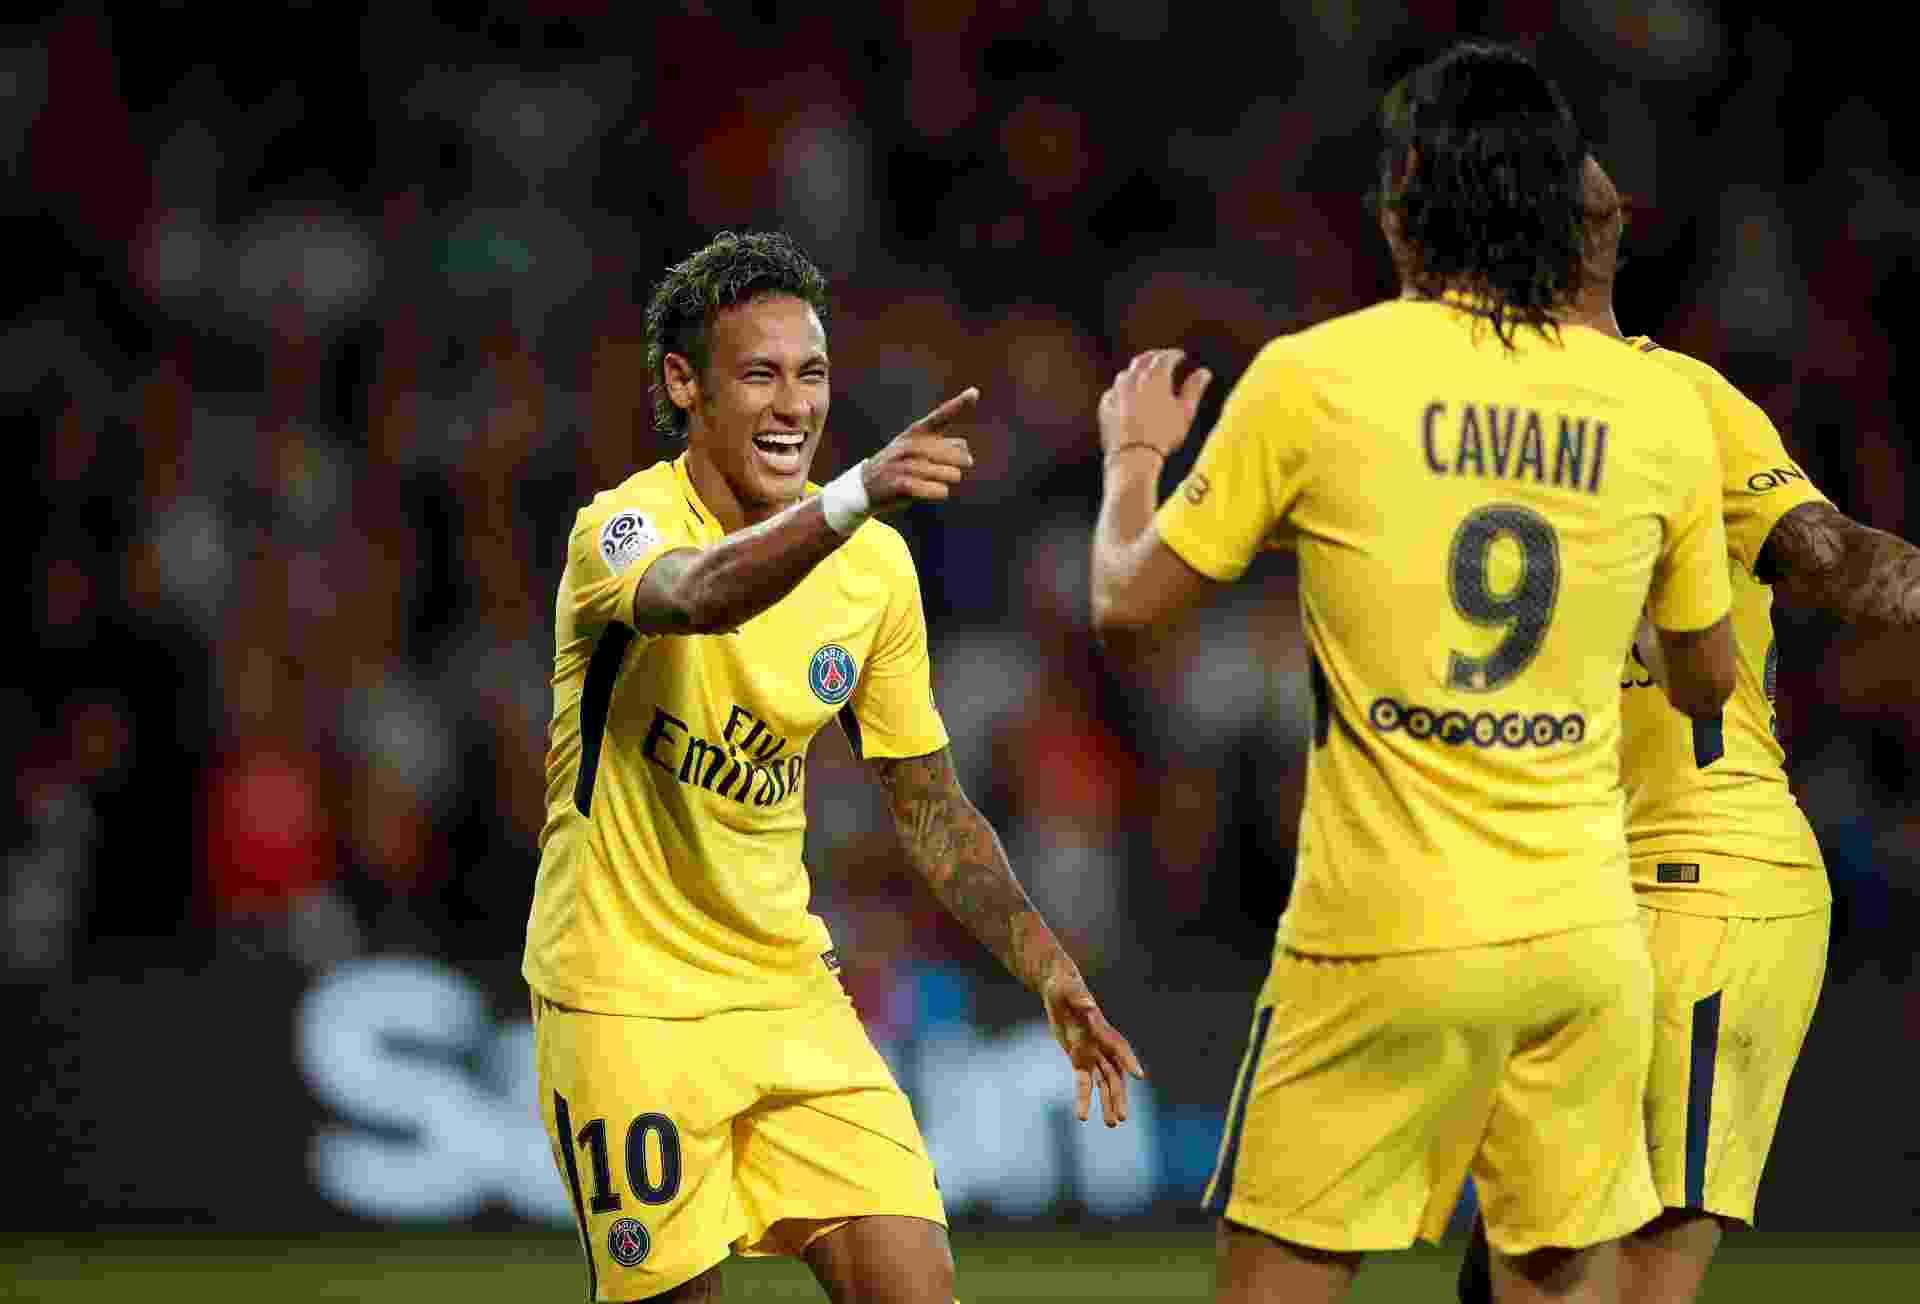 Neymar comemora gol com o uruguaio Cavani - Benoit Tessier/Reuters